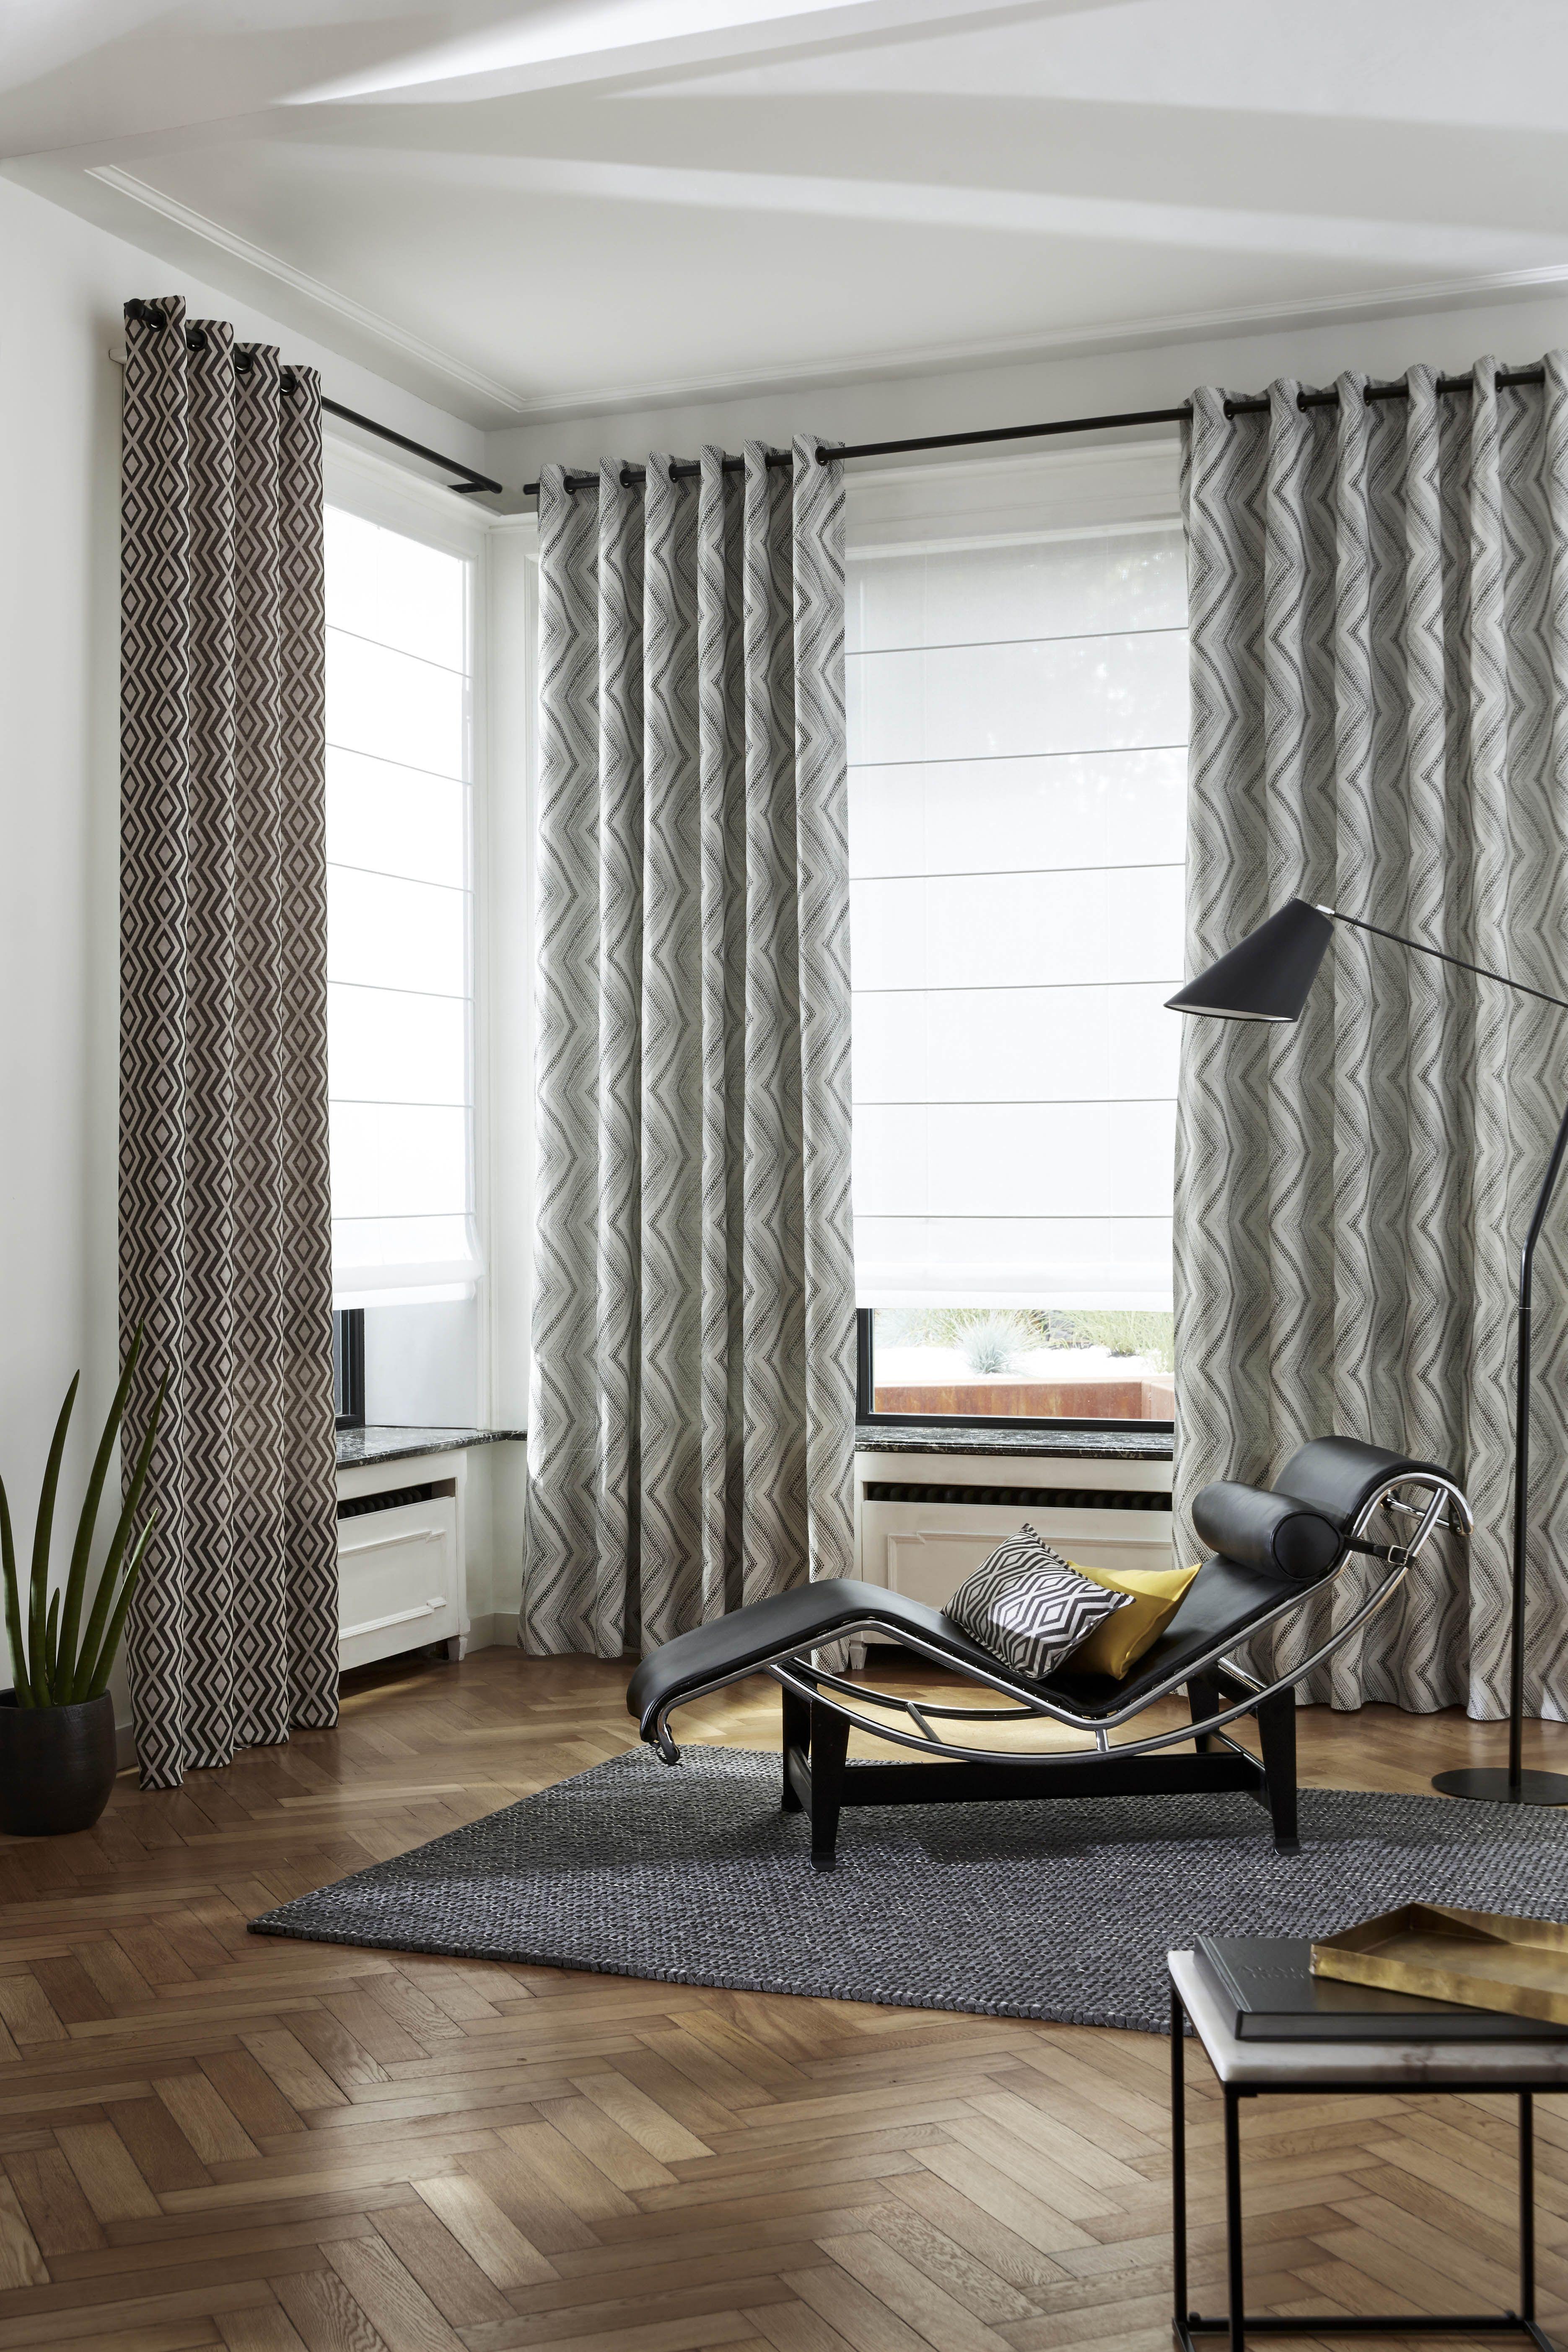 Chez vous habillage de fen tre pinterest cortinas - Cortinas negras decoracion ...